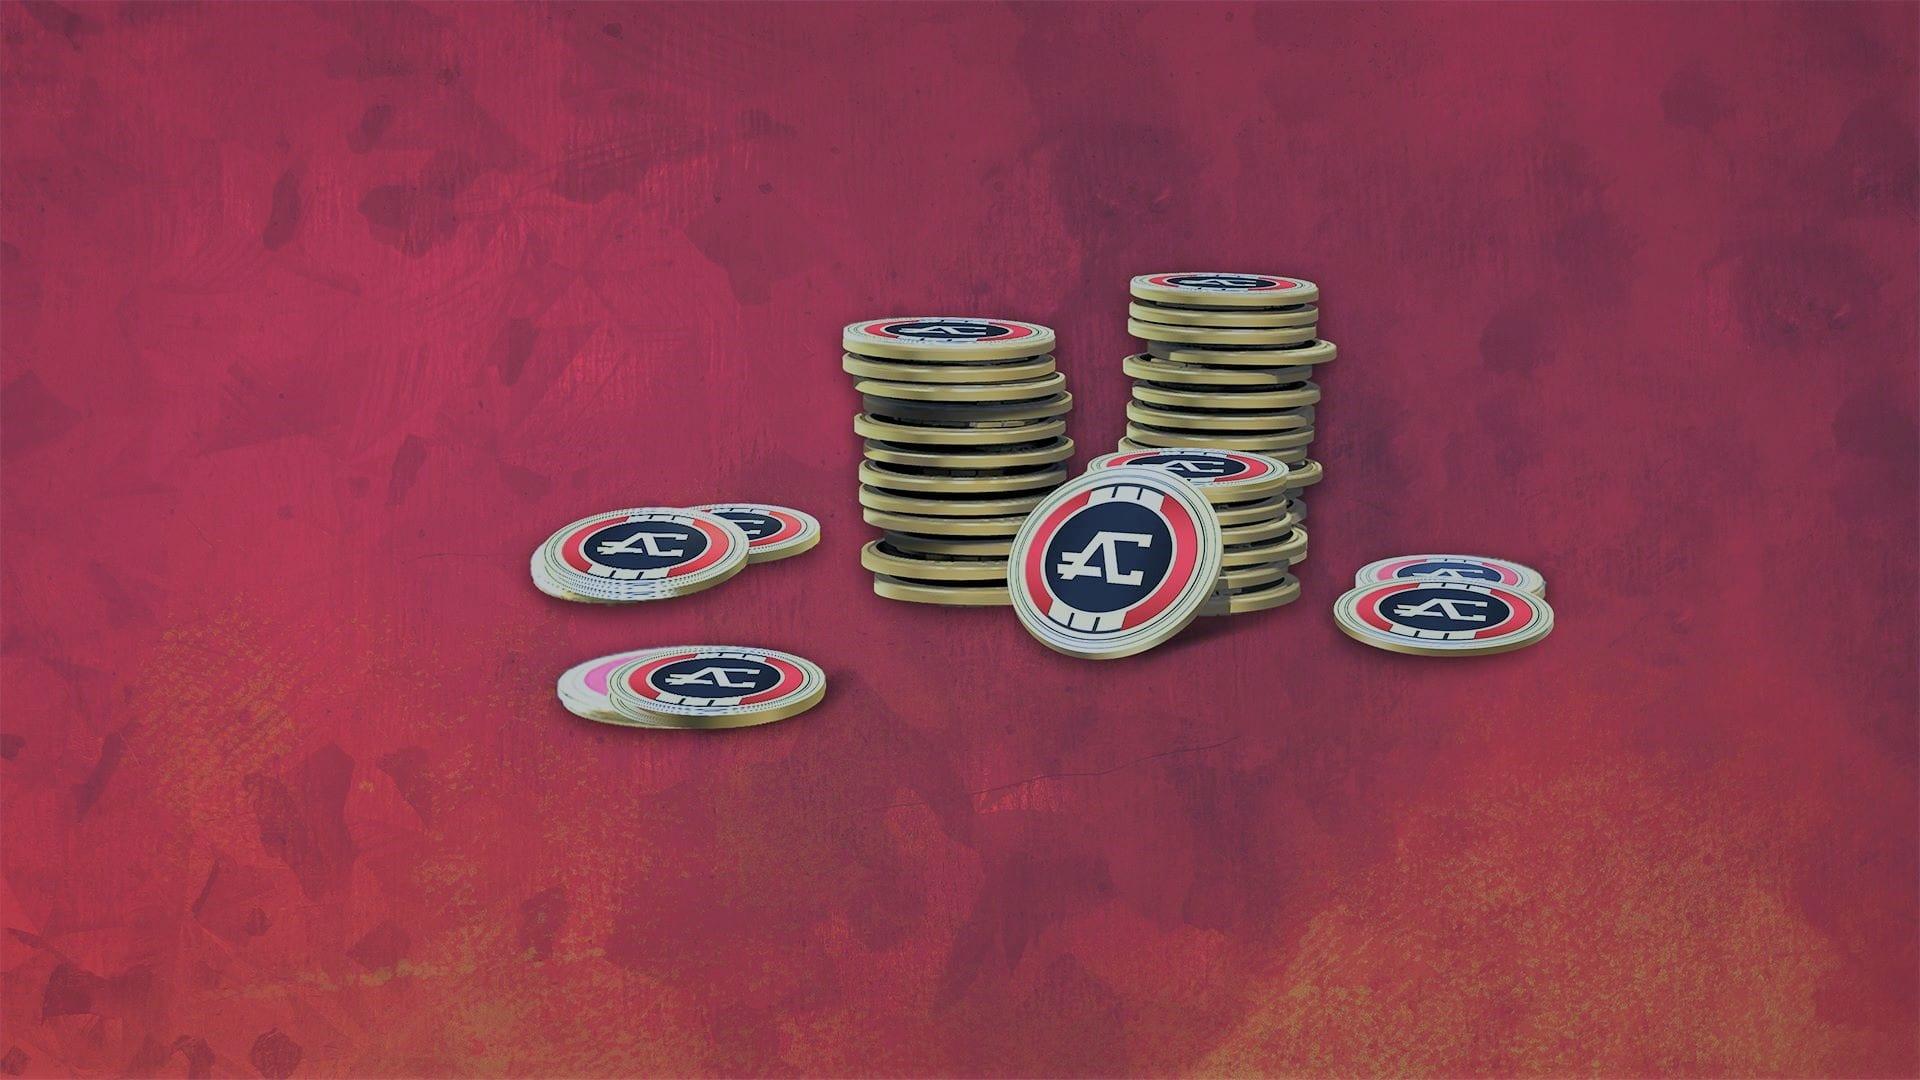 Apex Legends – Apex Coins, Legend Tokens Nasıl Kazanılır?